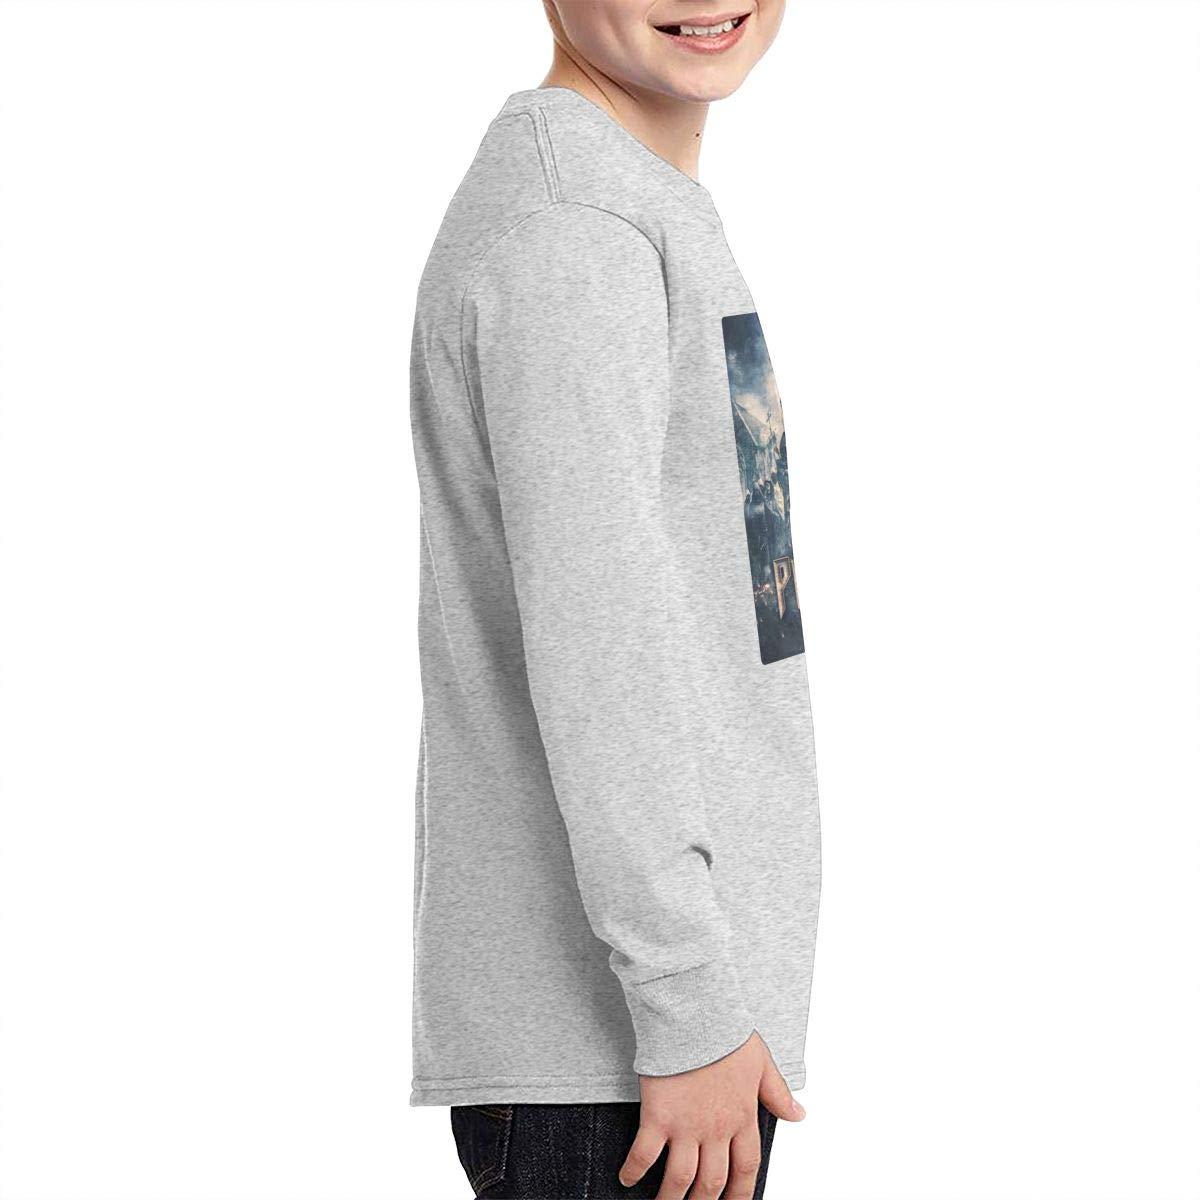 HangHisi Powerwolf Boys /& Girls O Neck Regular Style Tee Long Sleeve T Shirt Leisure